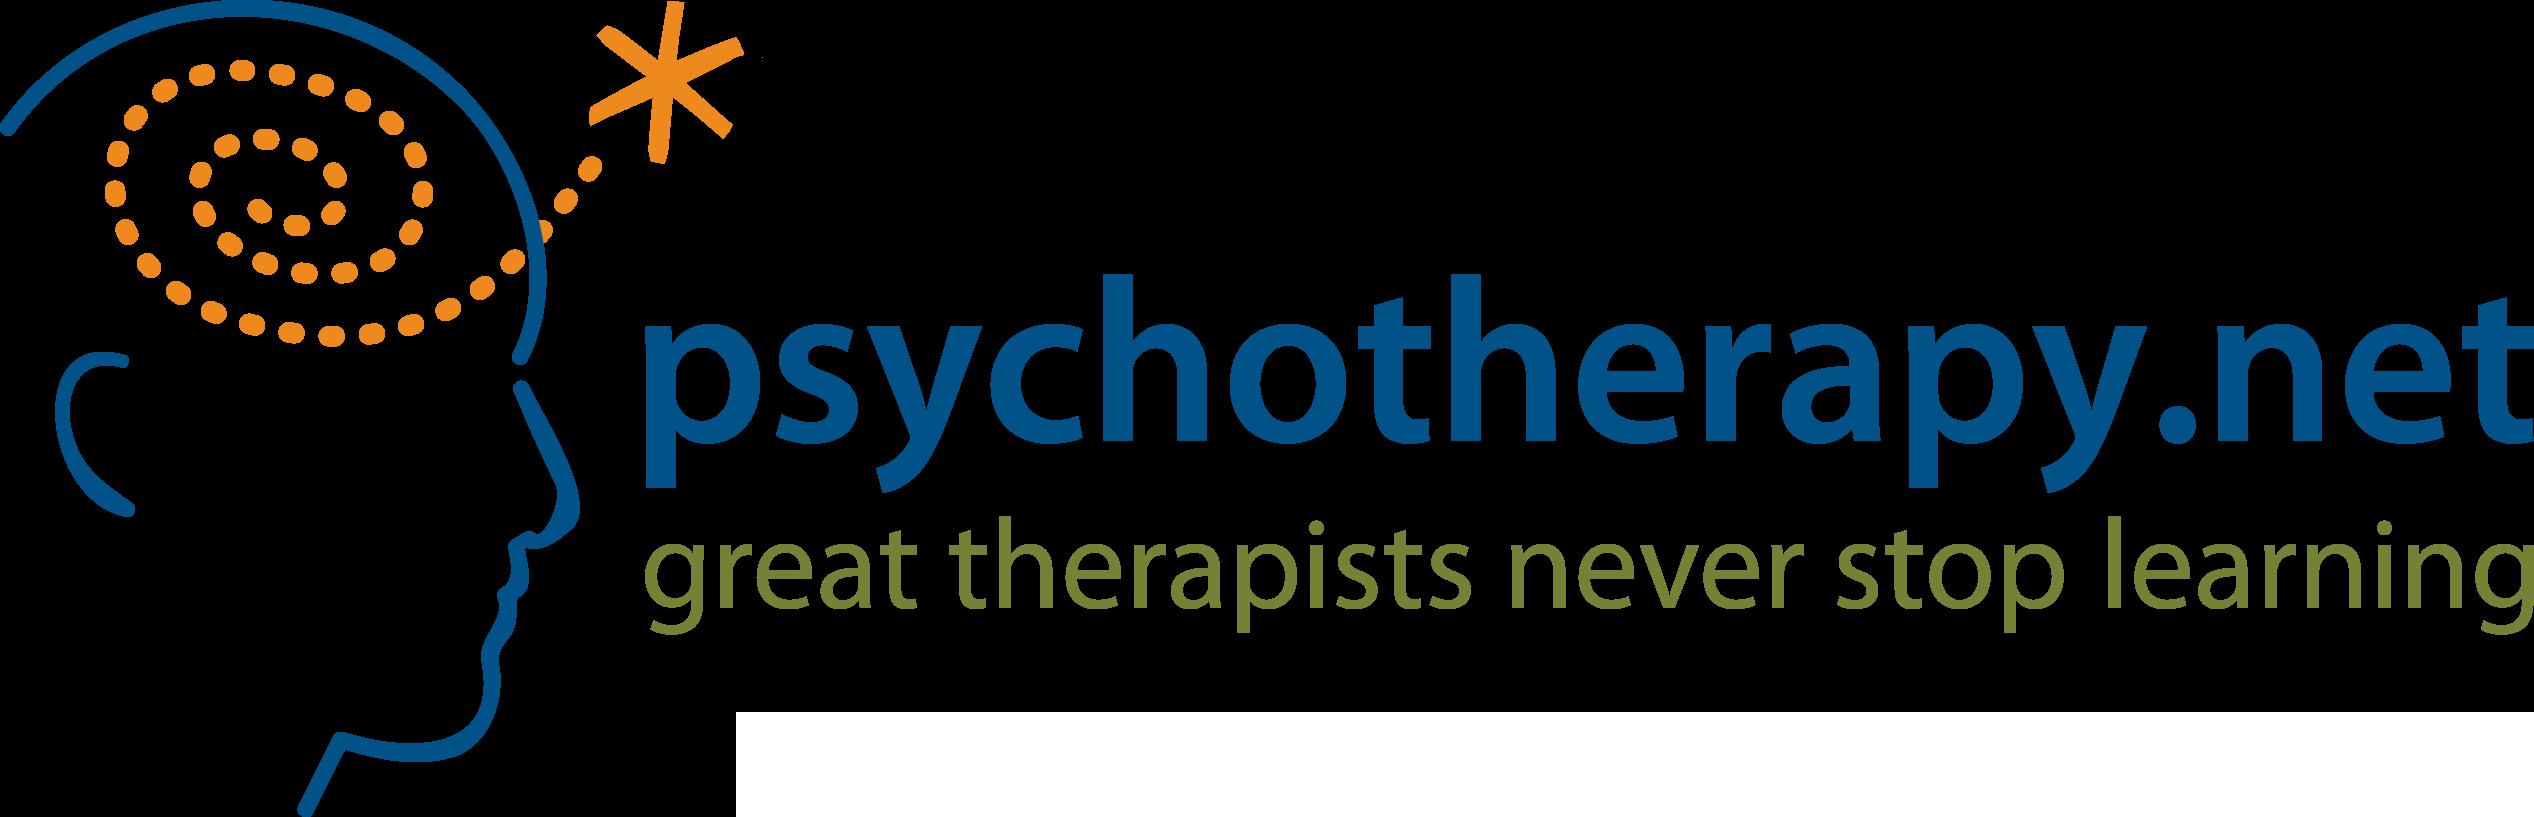 psychotherapy.net log